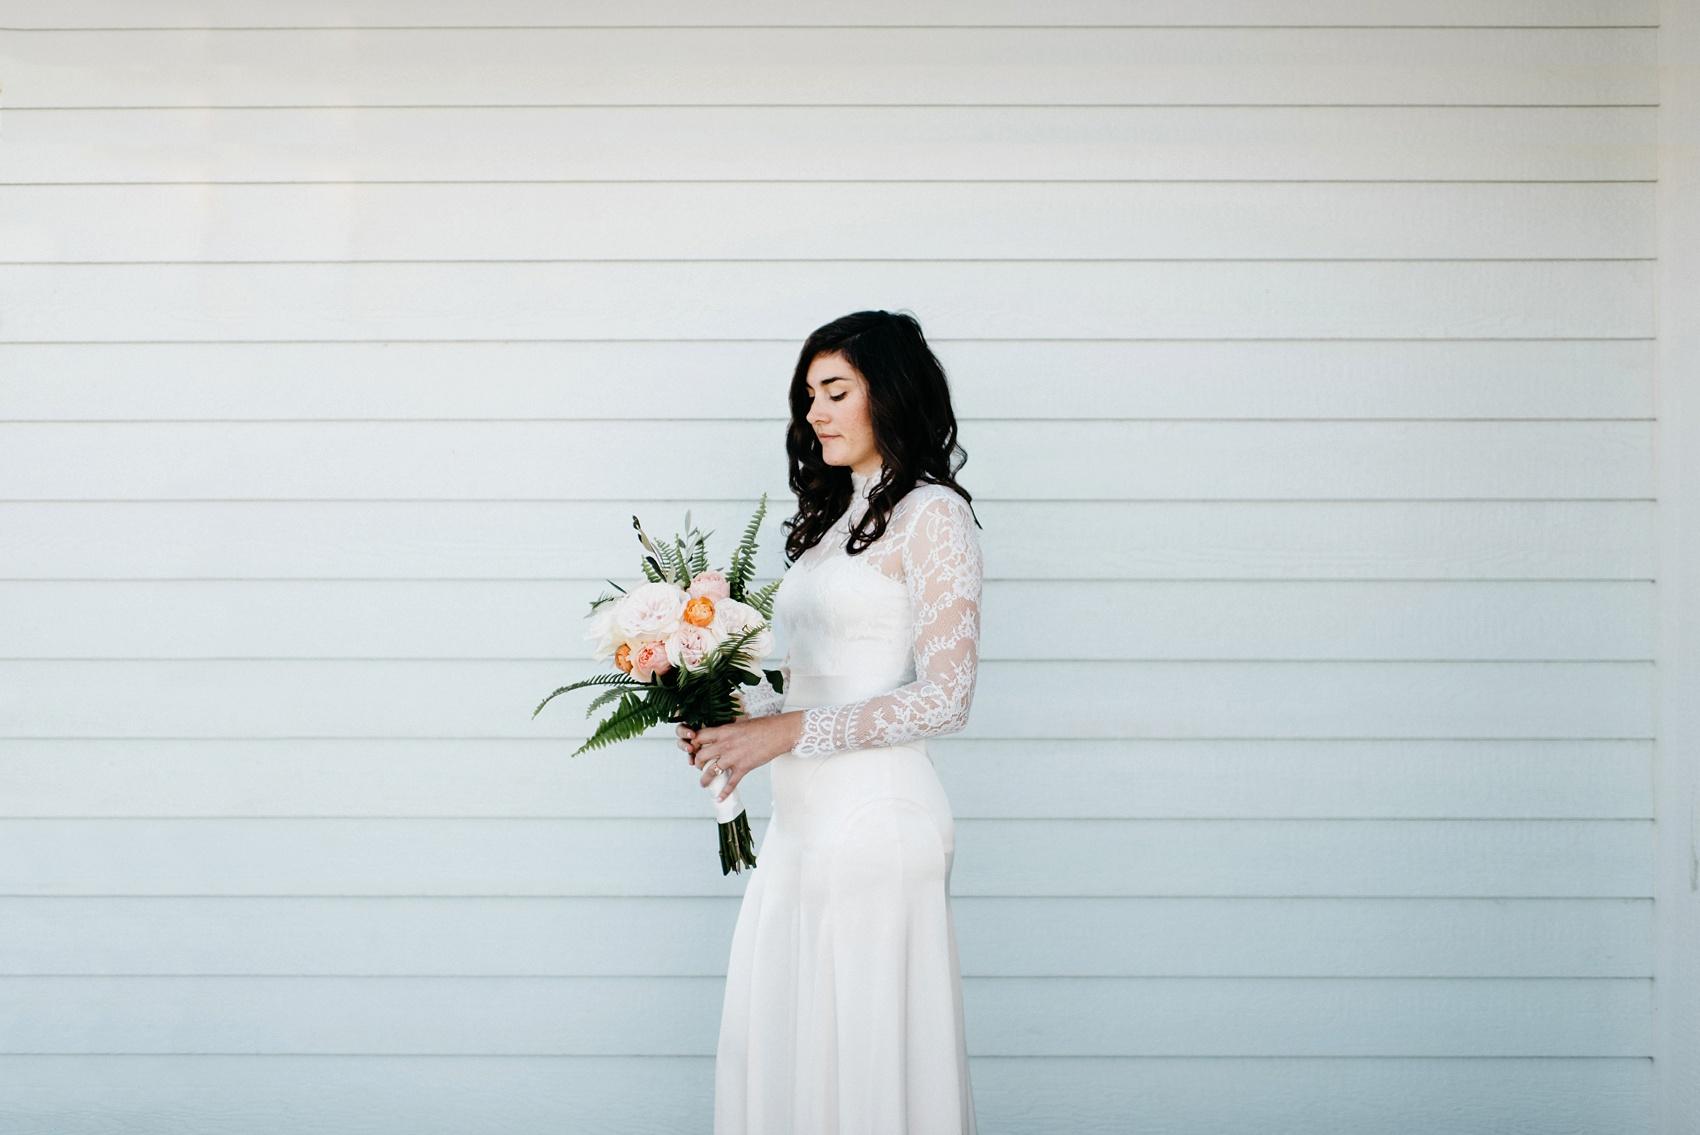 outerbanks_wedding_photographer_1257.jpg